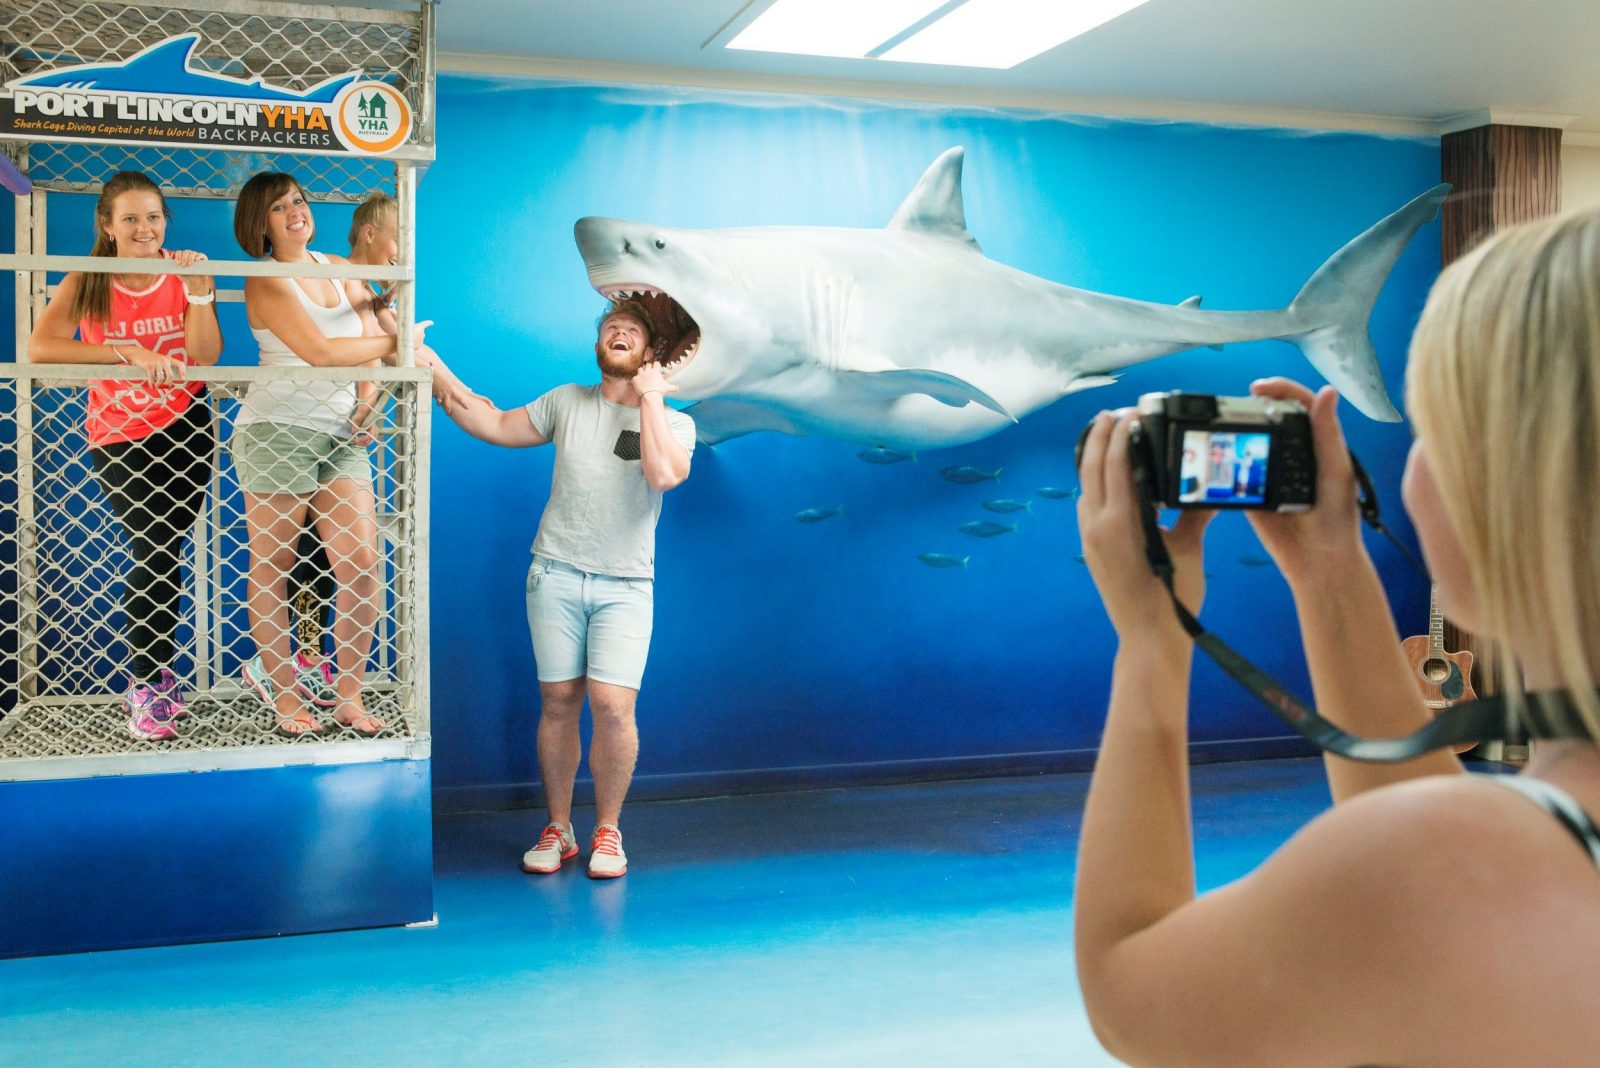 Meet the Great White Shark